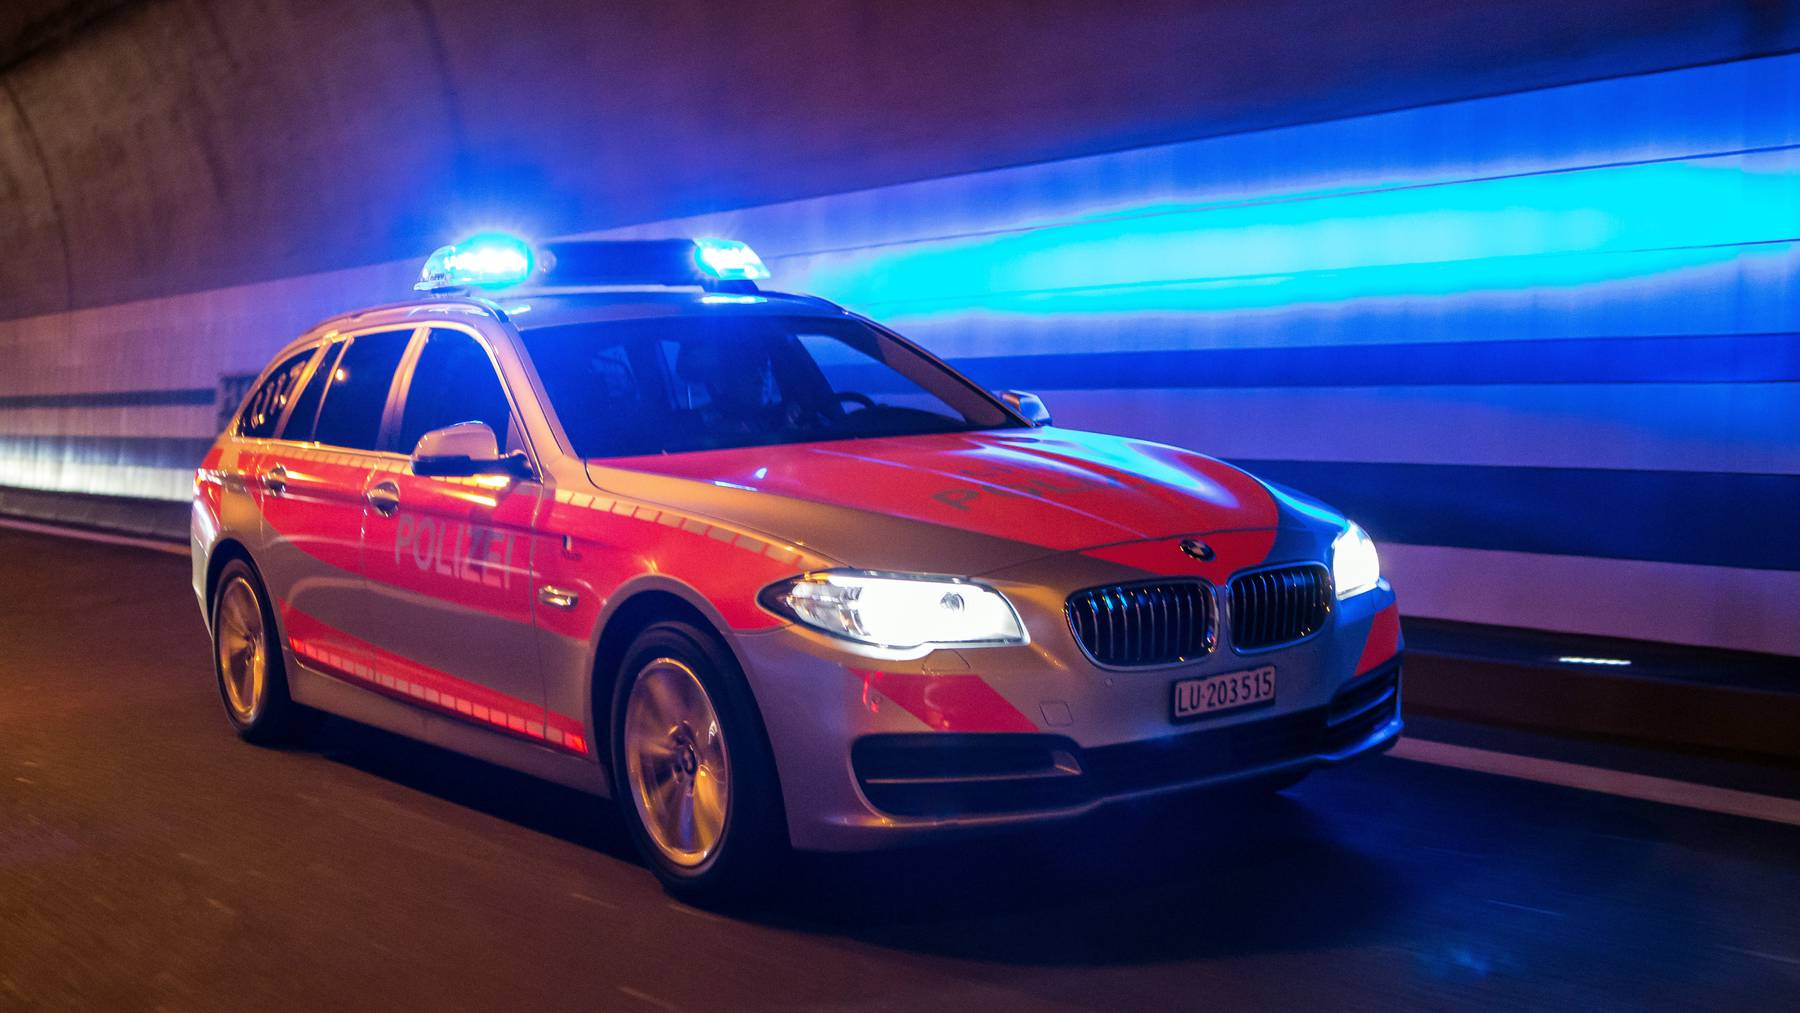 Gübelin-Überfall: Sechs Personen festgenommen